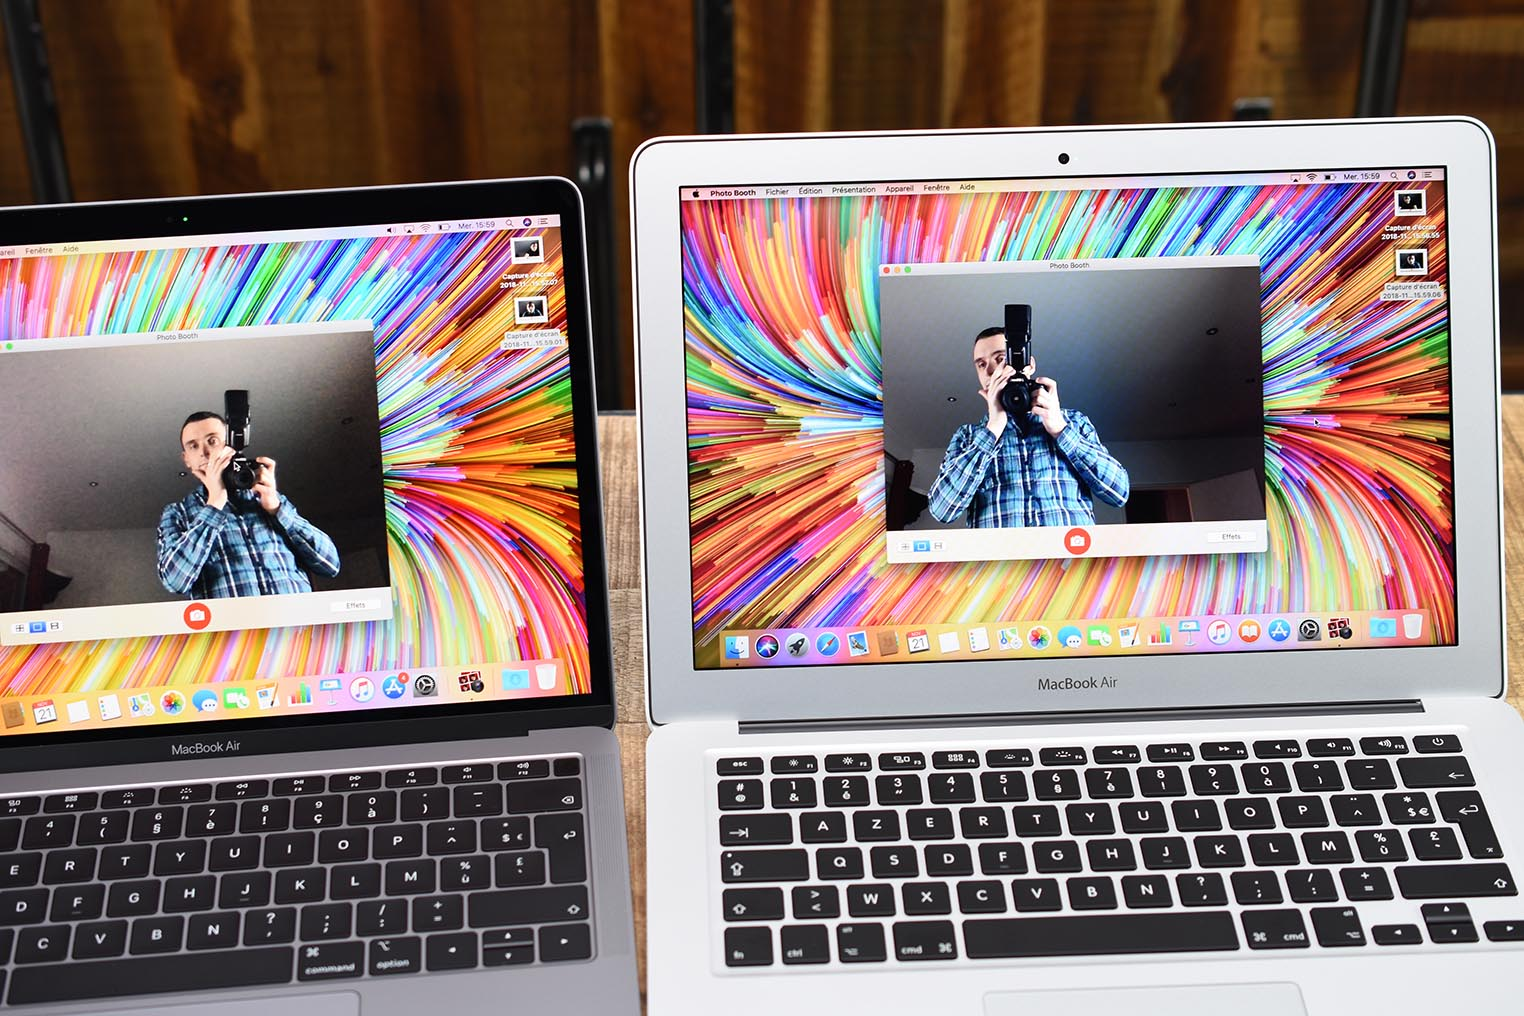 Comparatif webcam MacBook Air 2018